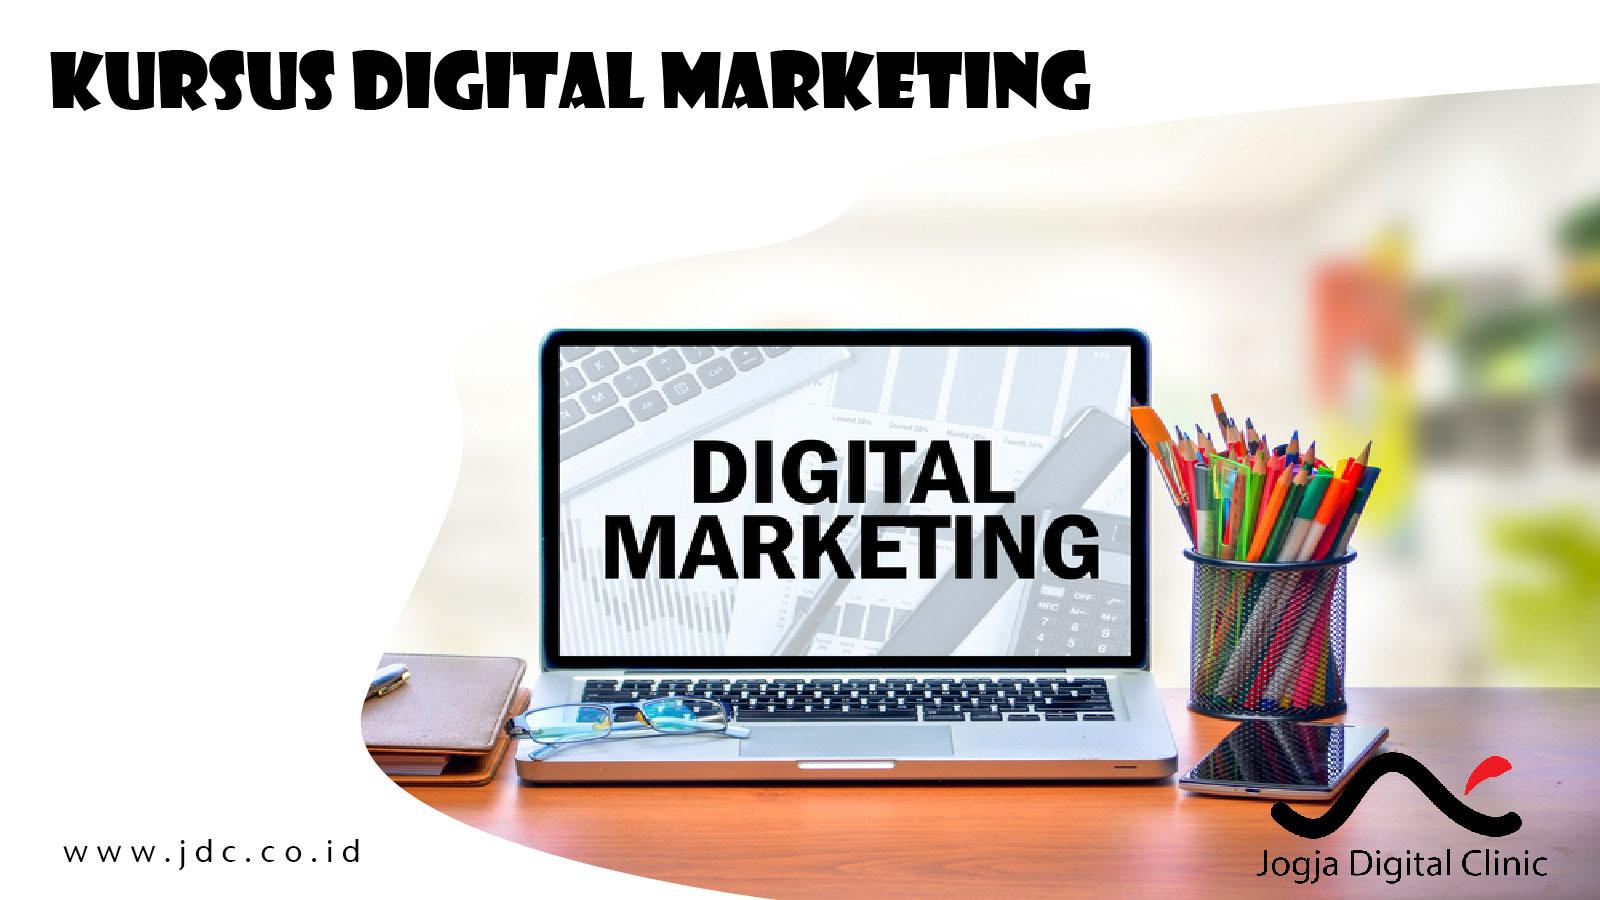 kursus digital marketing terbaik dan terpercaya